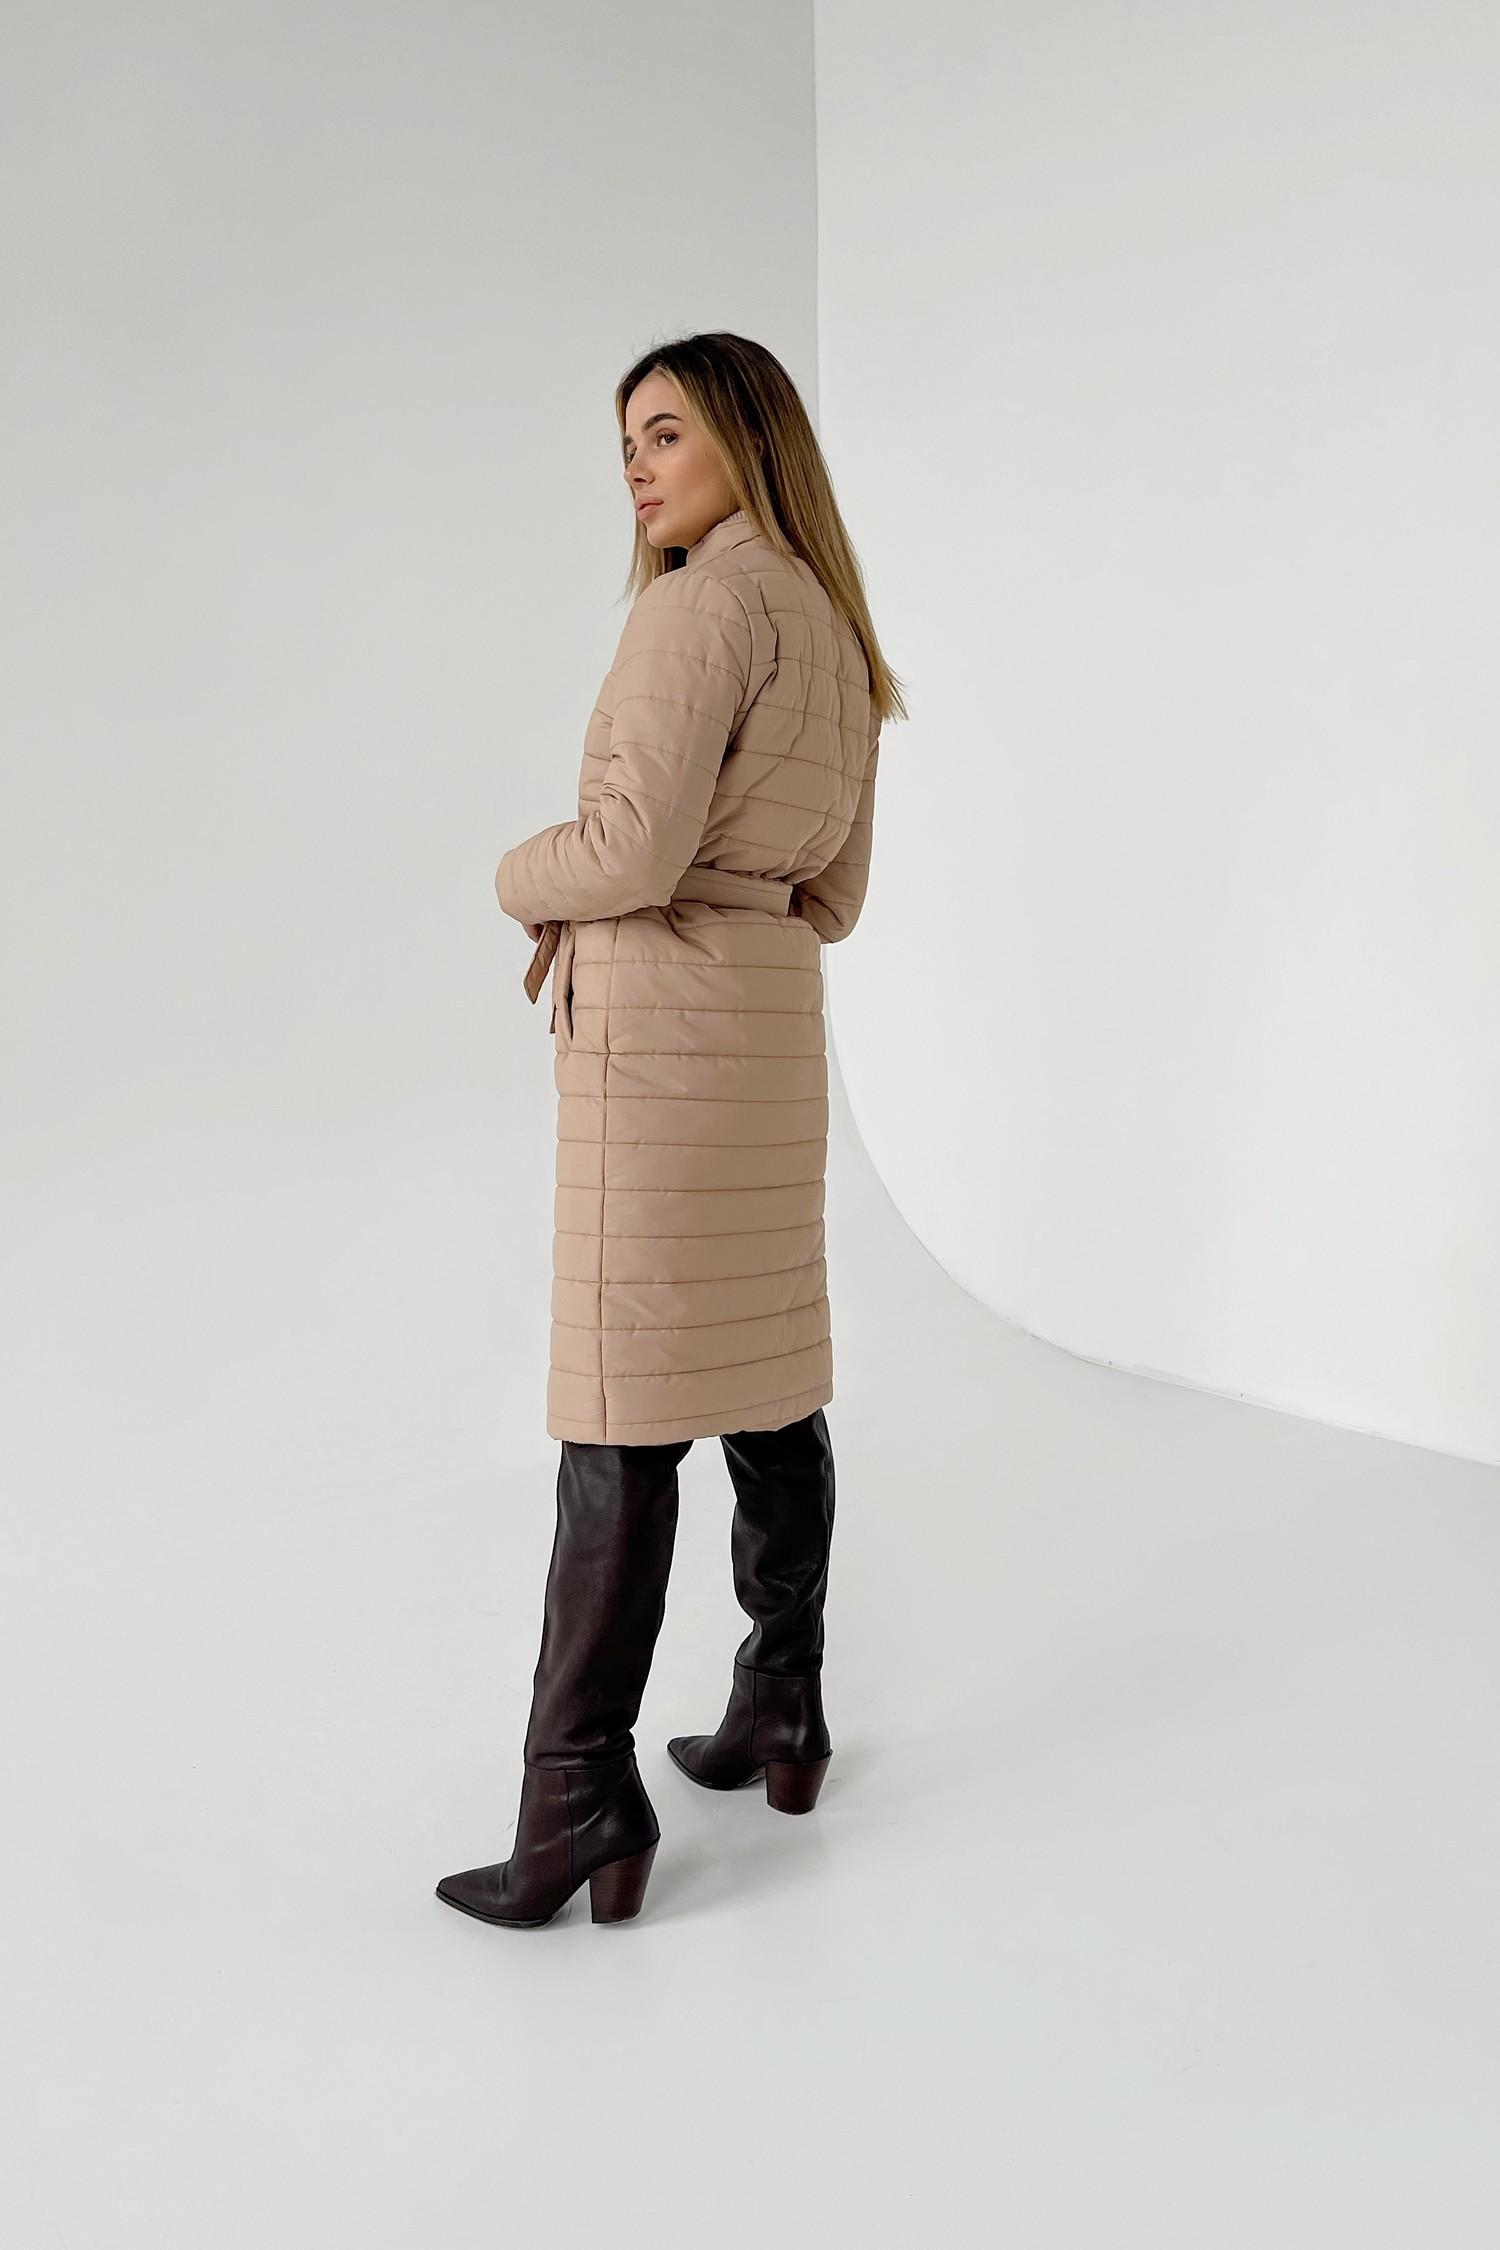 Пальто стеганое camel - THE LACE